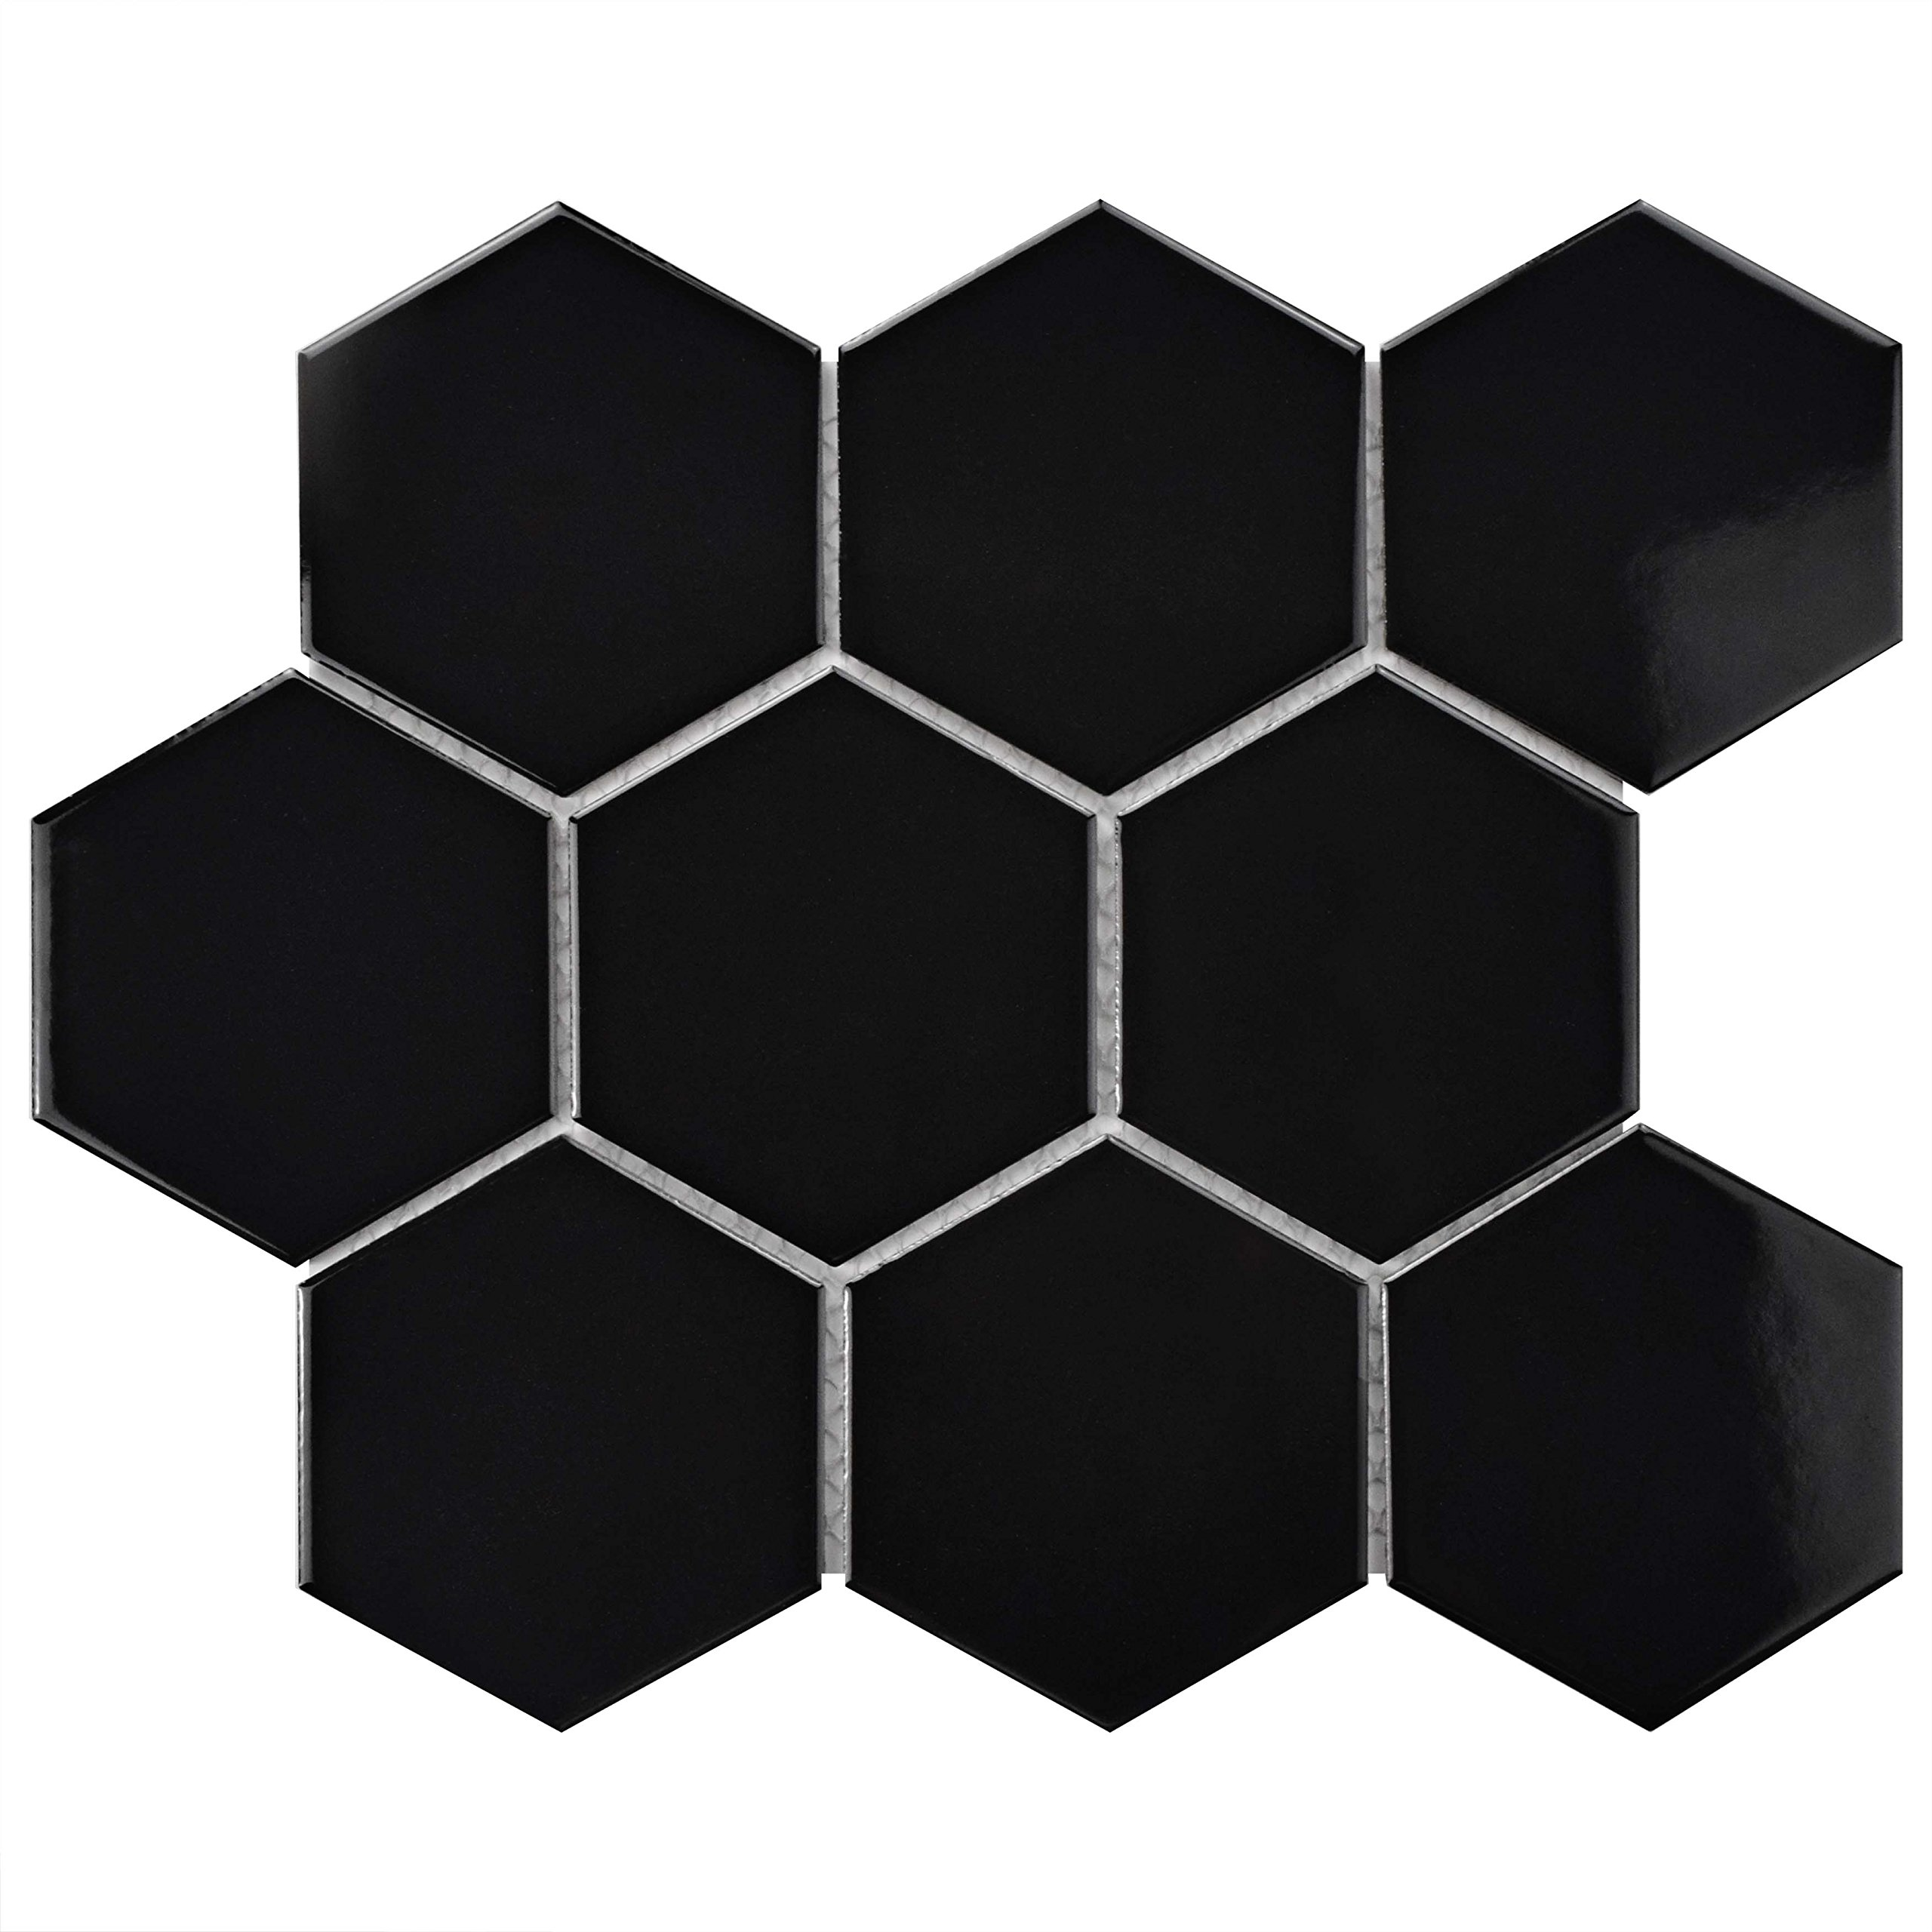 SomerTile FWRM4HGB Retro Super Hex Porcelain Mosaic Floor & Wall Tile, 10'' x 11.5'', Glossy Black, 10 Piece